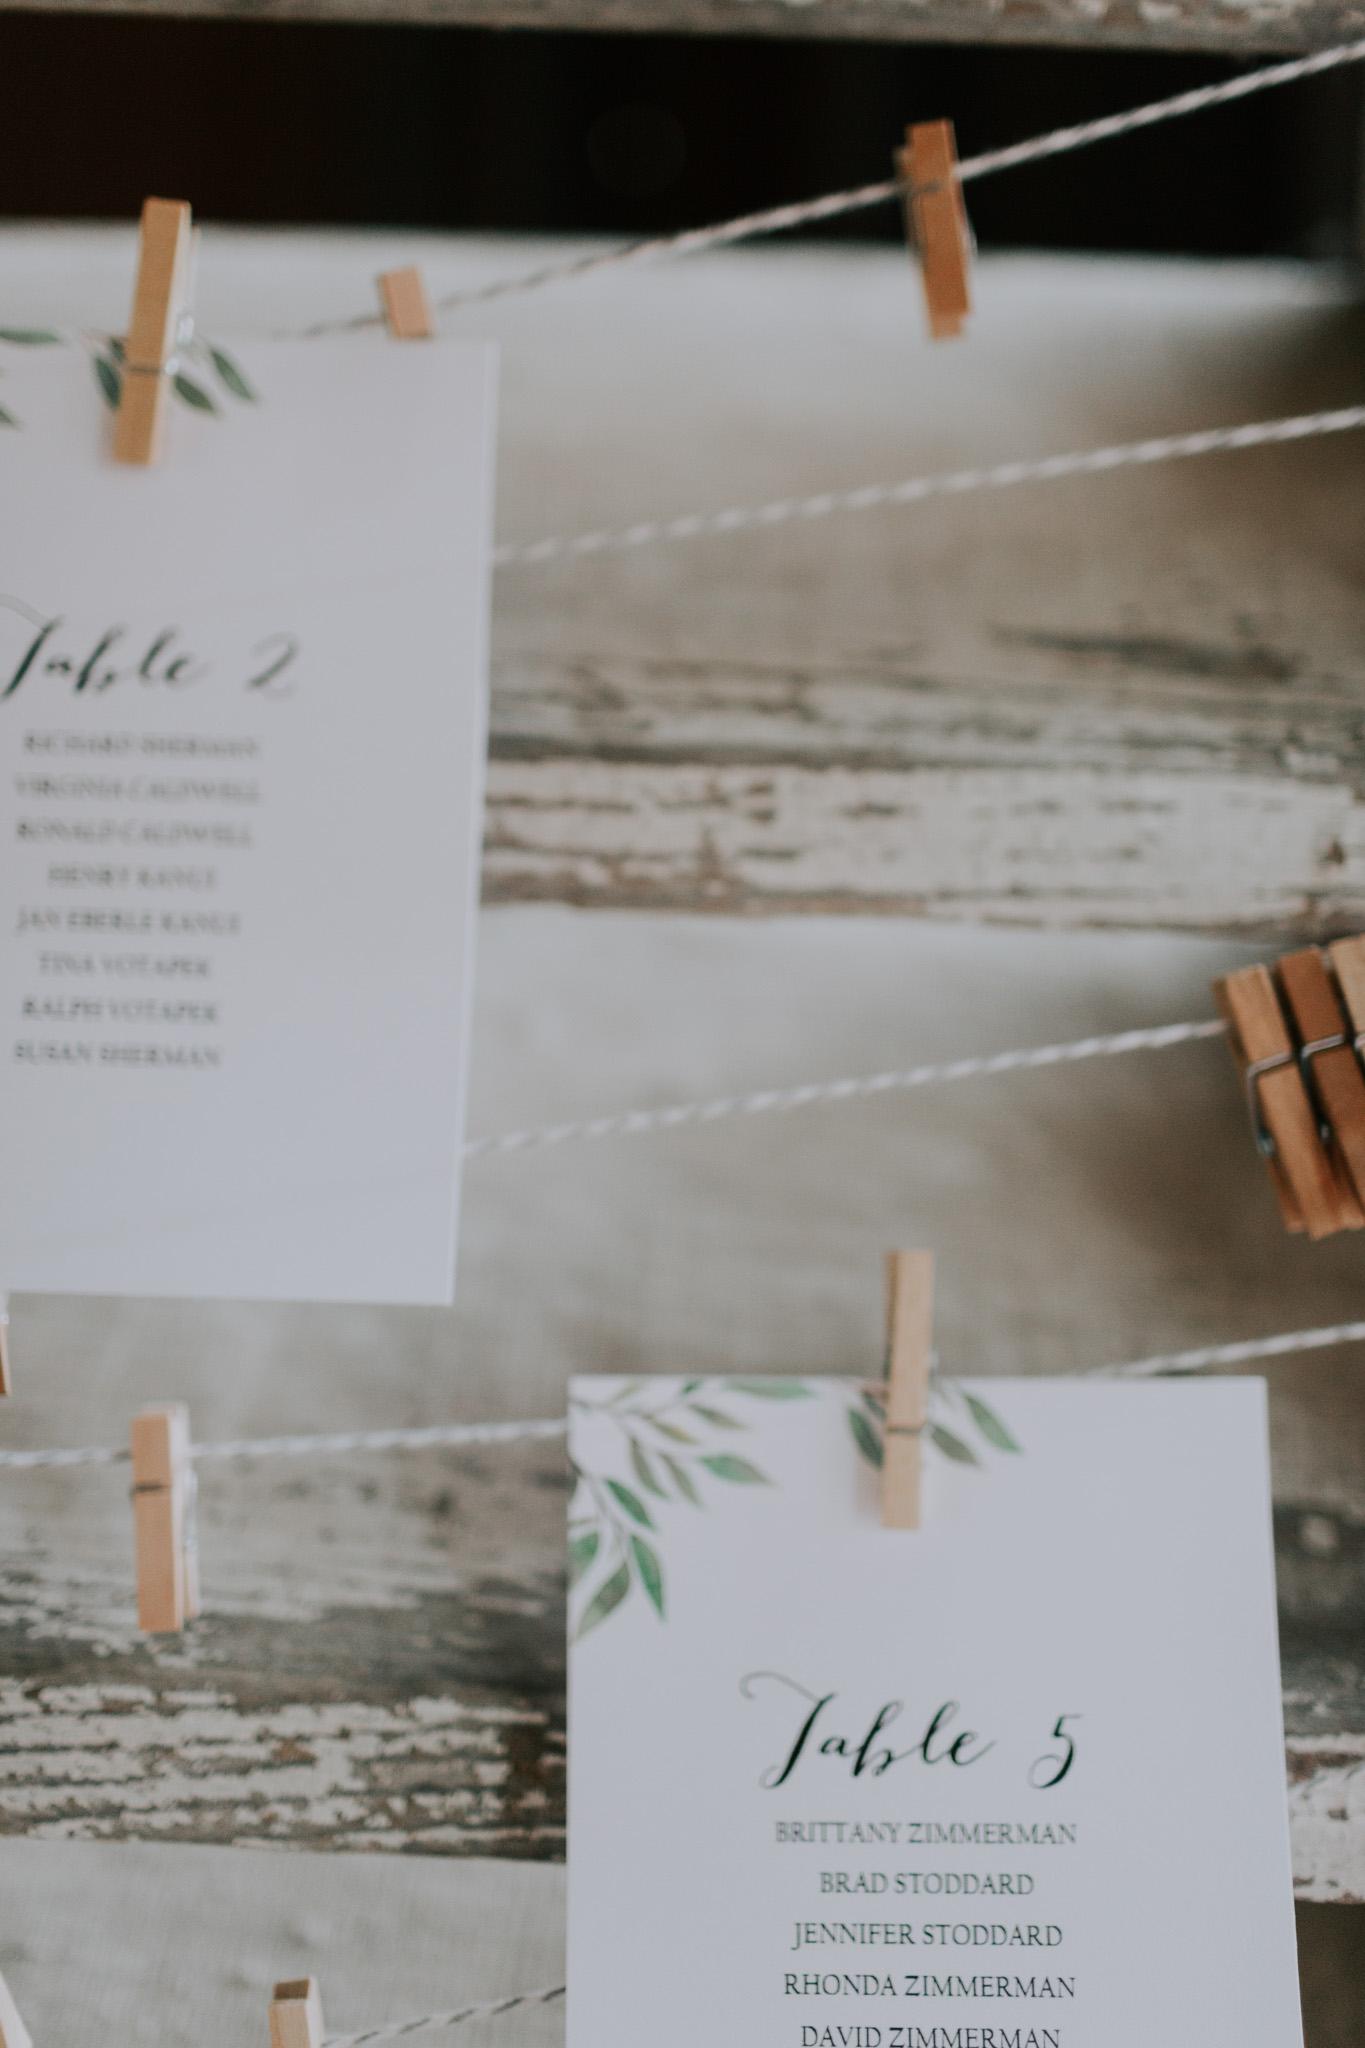 MillCreek-Wilde-Wedding-Barn-Michigan-Eliza-Eric-Vafa-Photo852.jpg